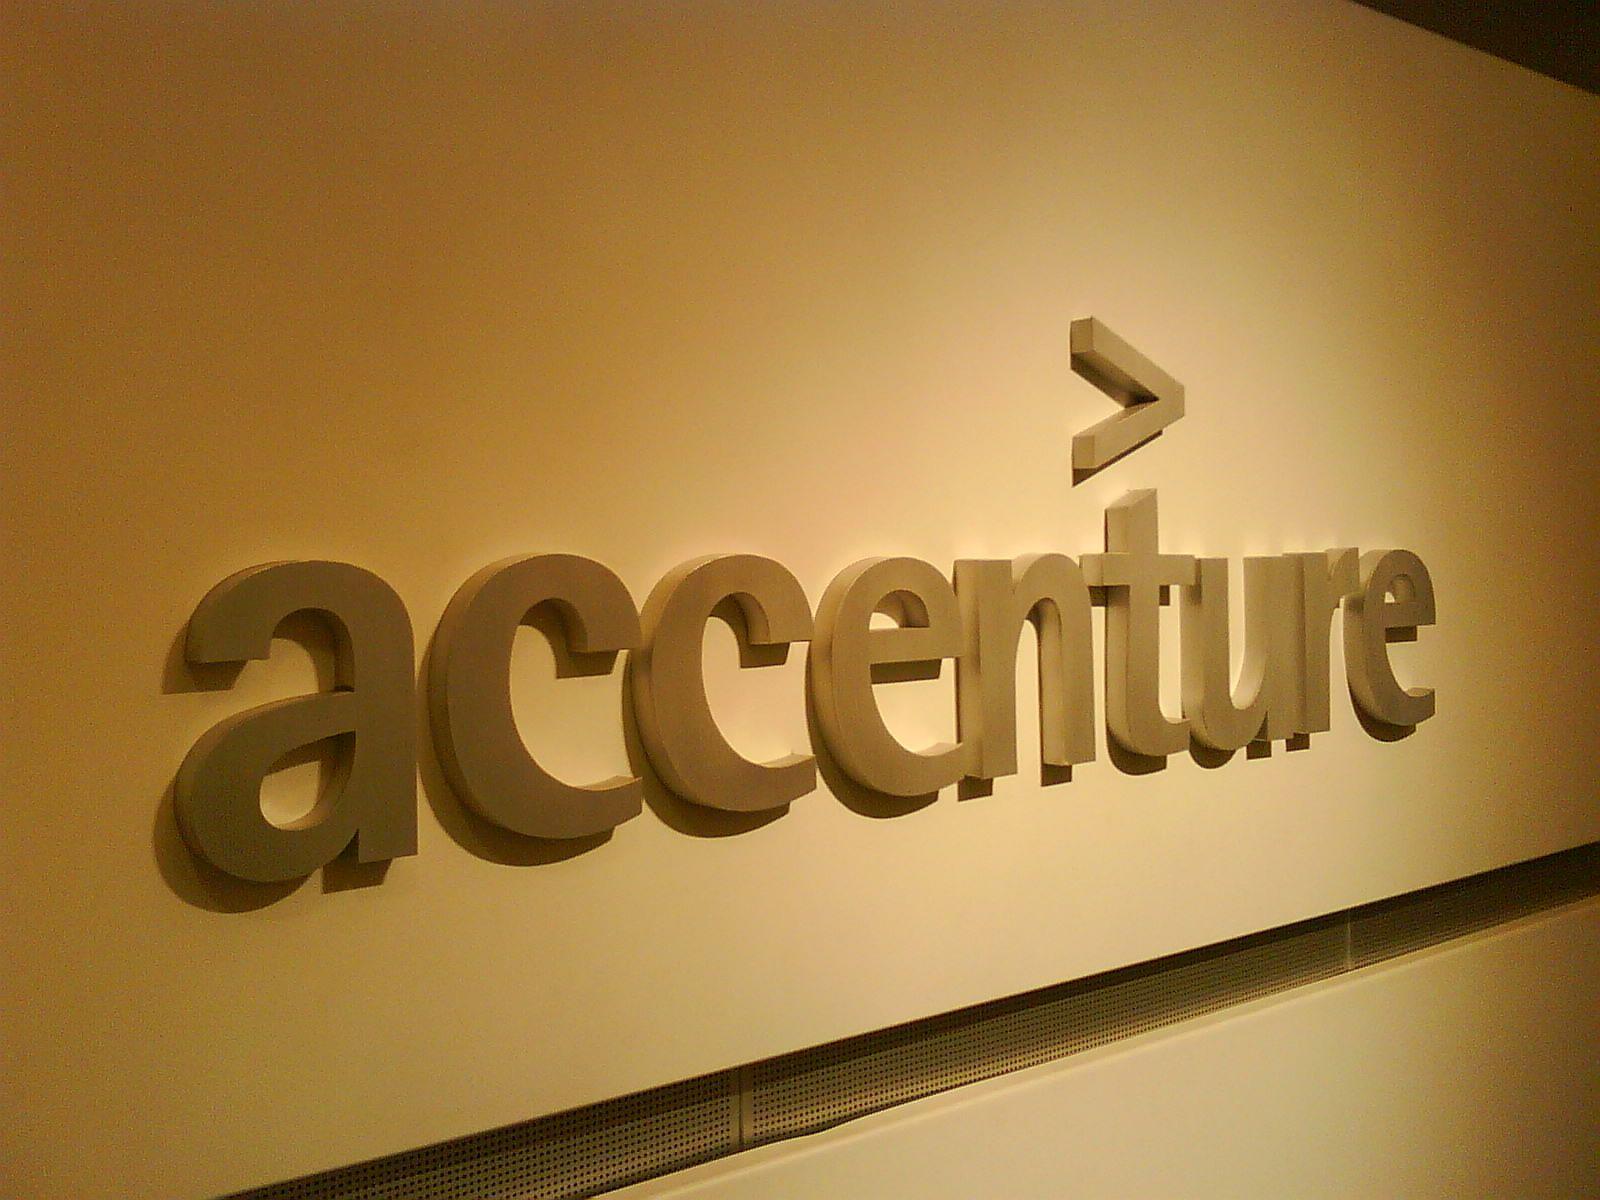 Accenture Walkins for Freshers Jobs Hiring Job Description